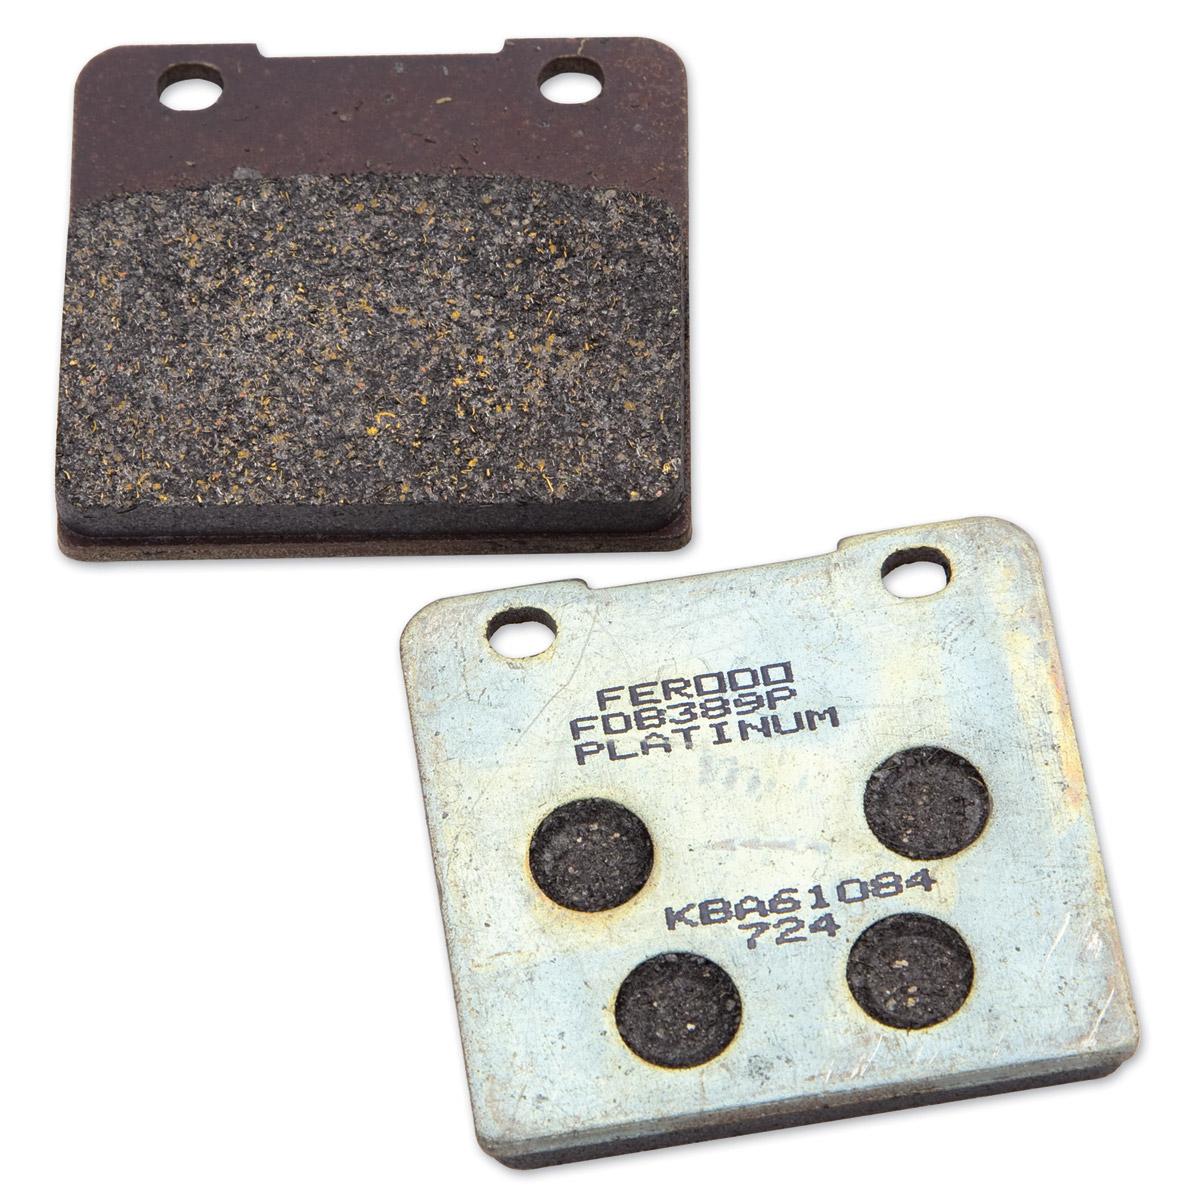 Ferodo Front or Rear Organic Brake Pads